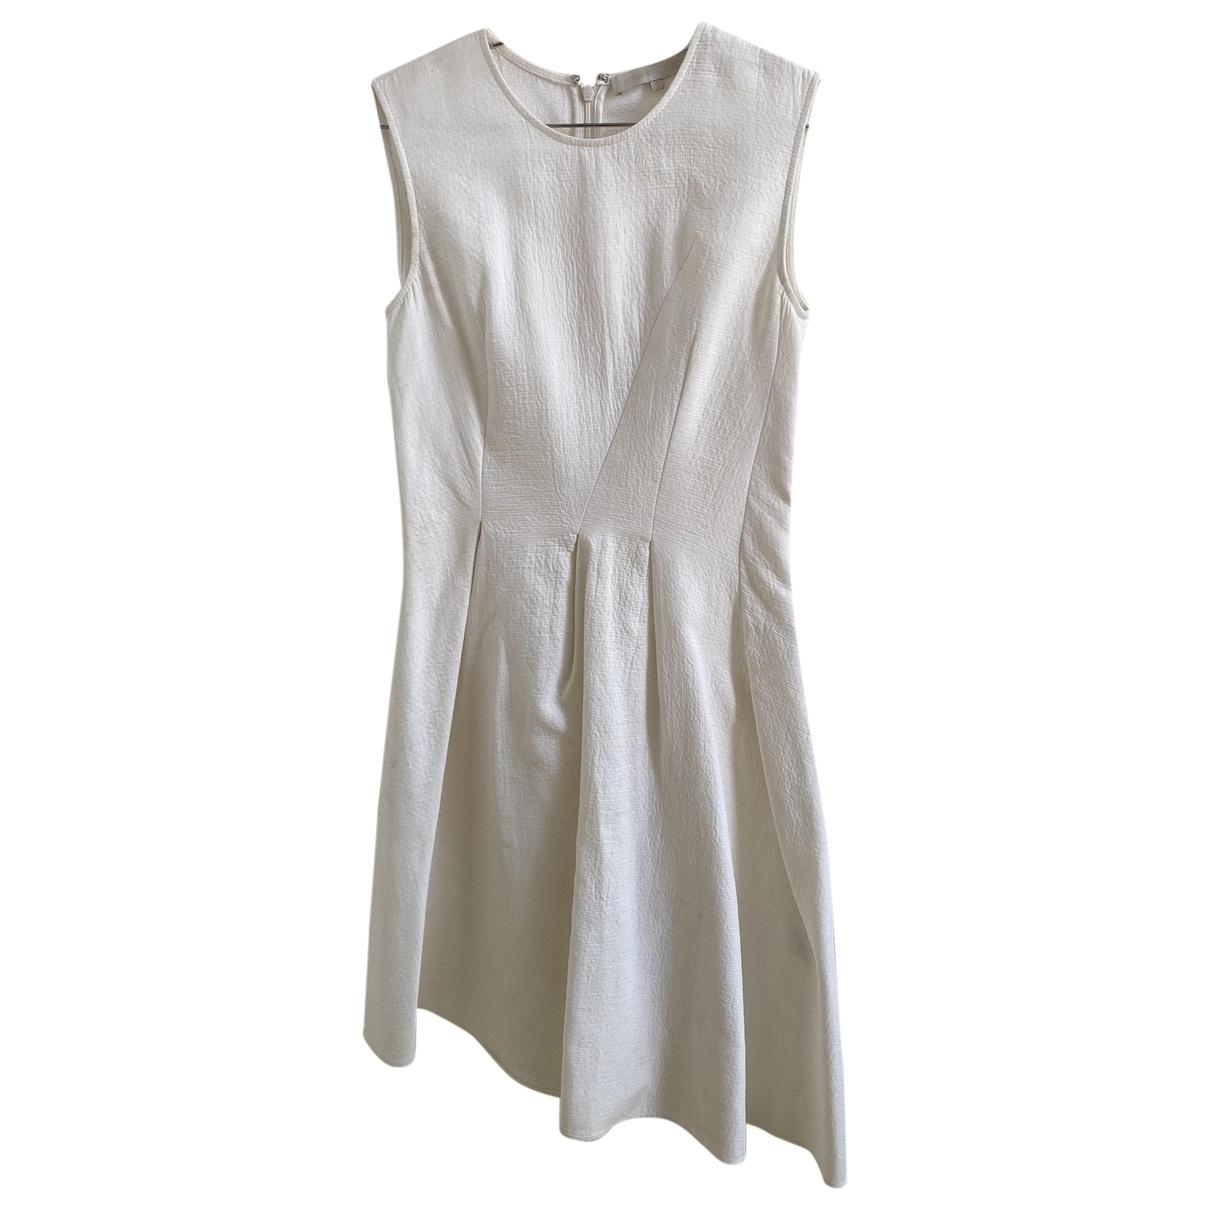 Vanessa Bruno \N Ecru Linen dress for Women 34 FR